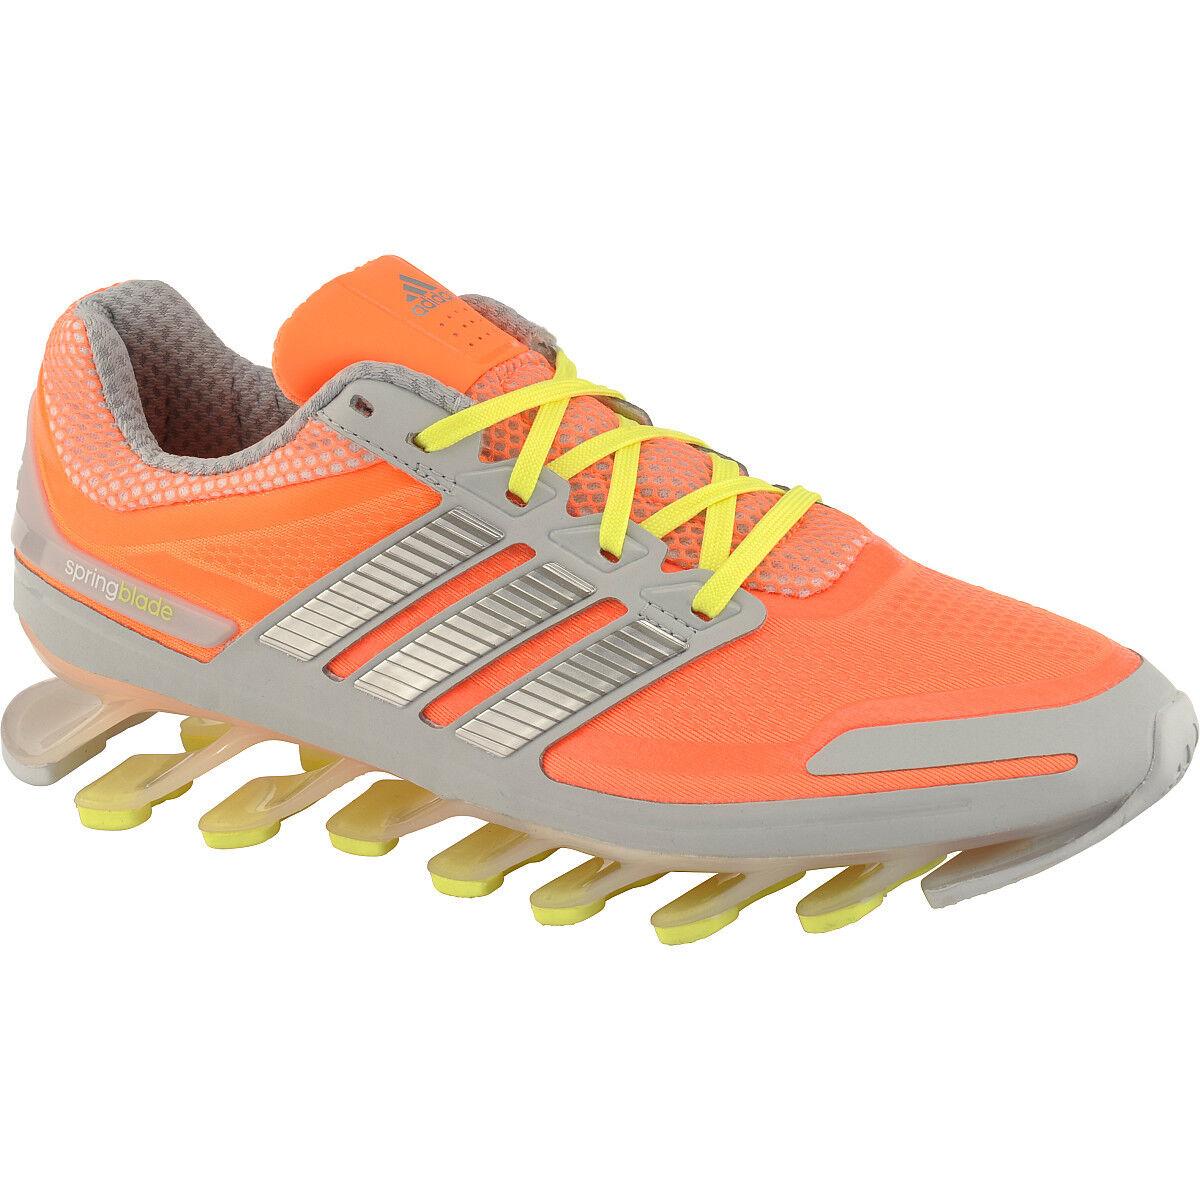 Adidas running springblade W running mujer running Adidas W zapatos d66233 7e2018 7ada60